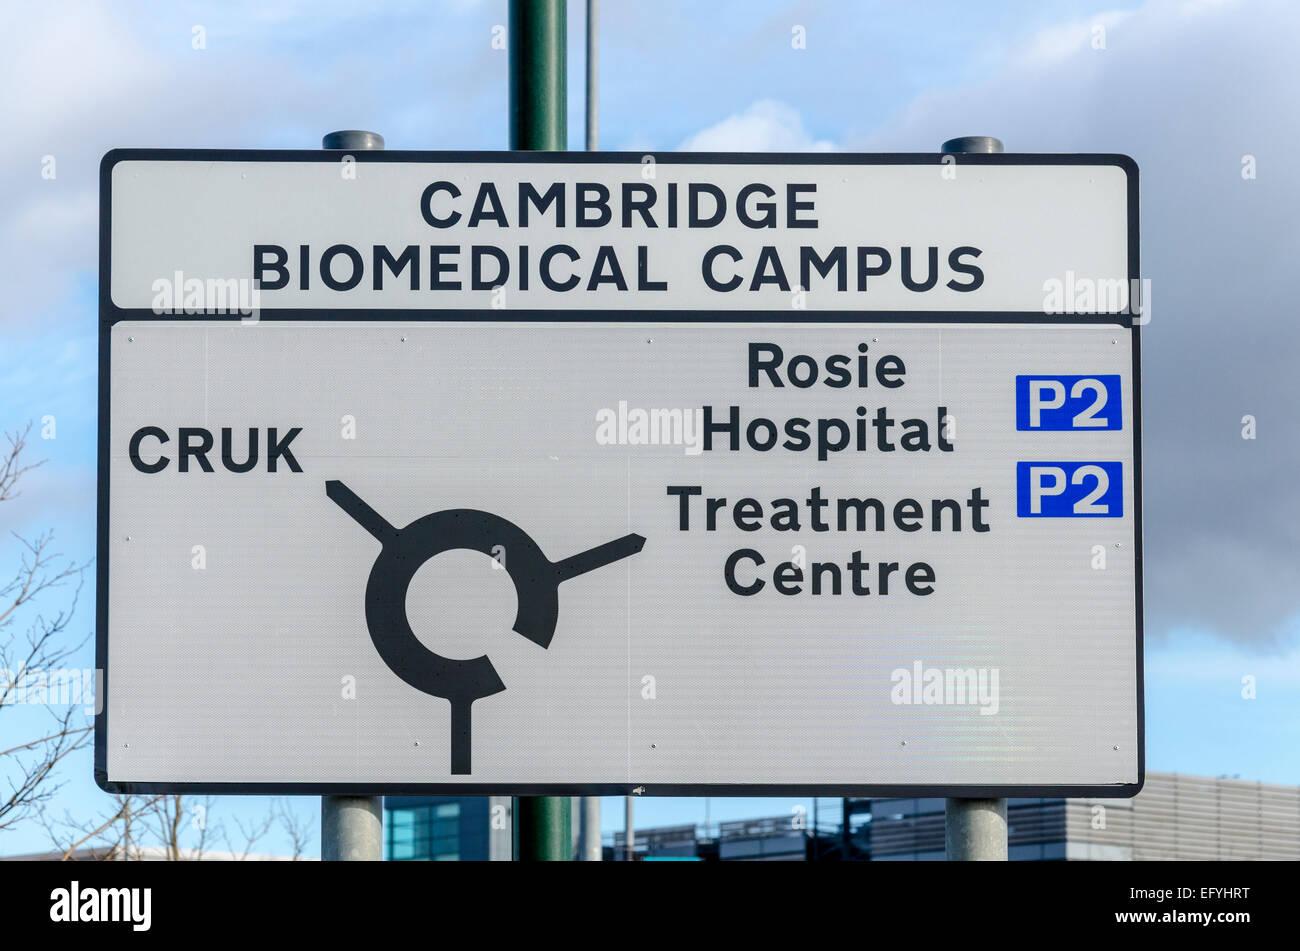 Cambridge Biomedical Campus sign - Stock Image